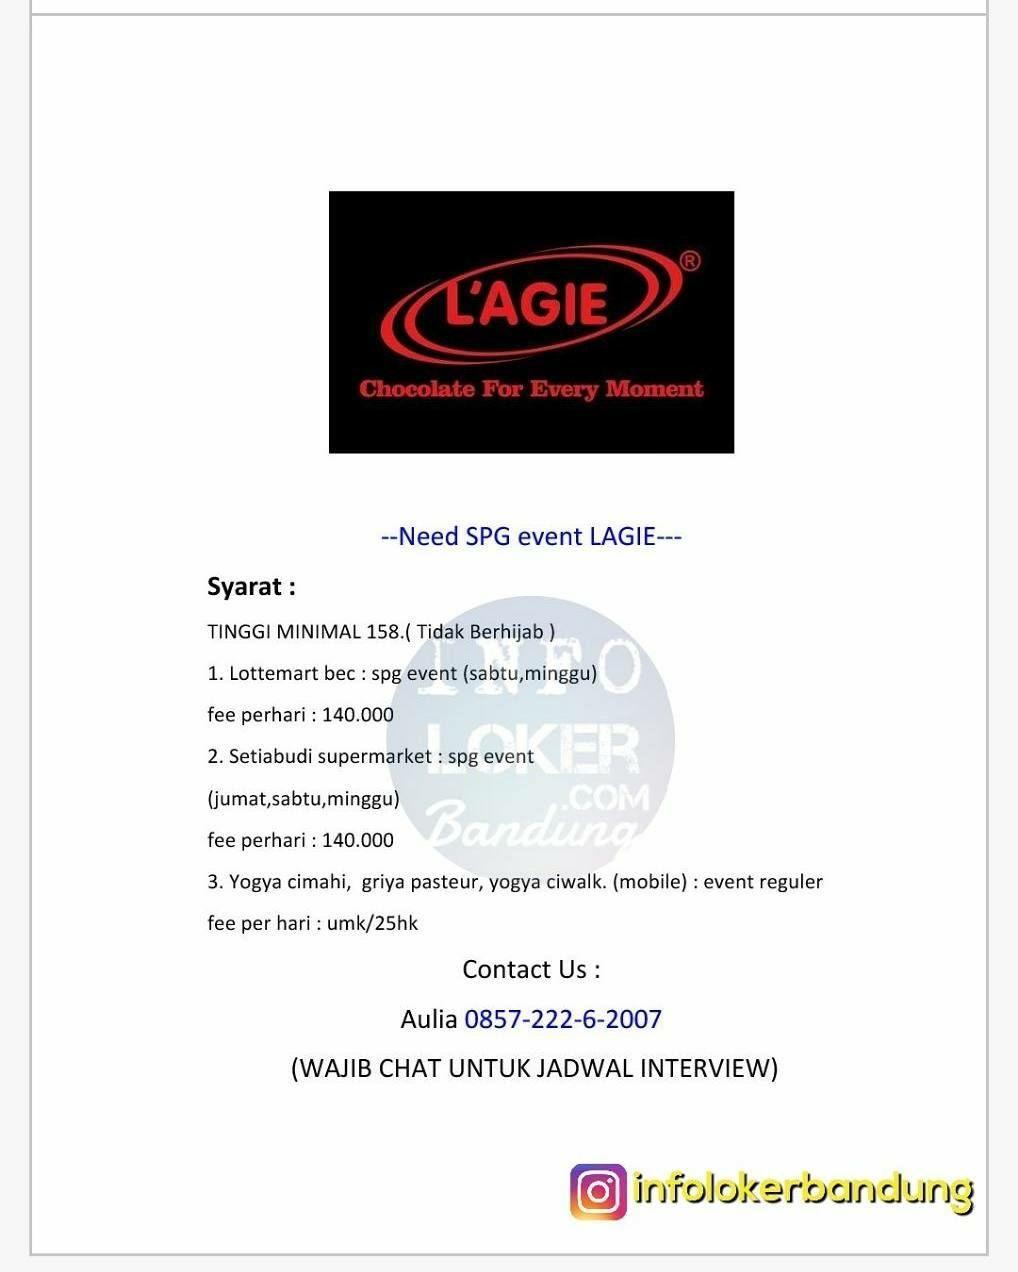 Lowongan Kerja Spg Event L Agie Bandung November 2017